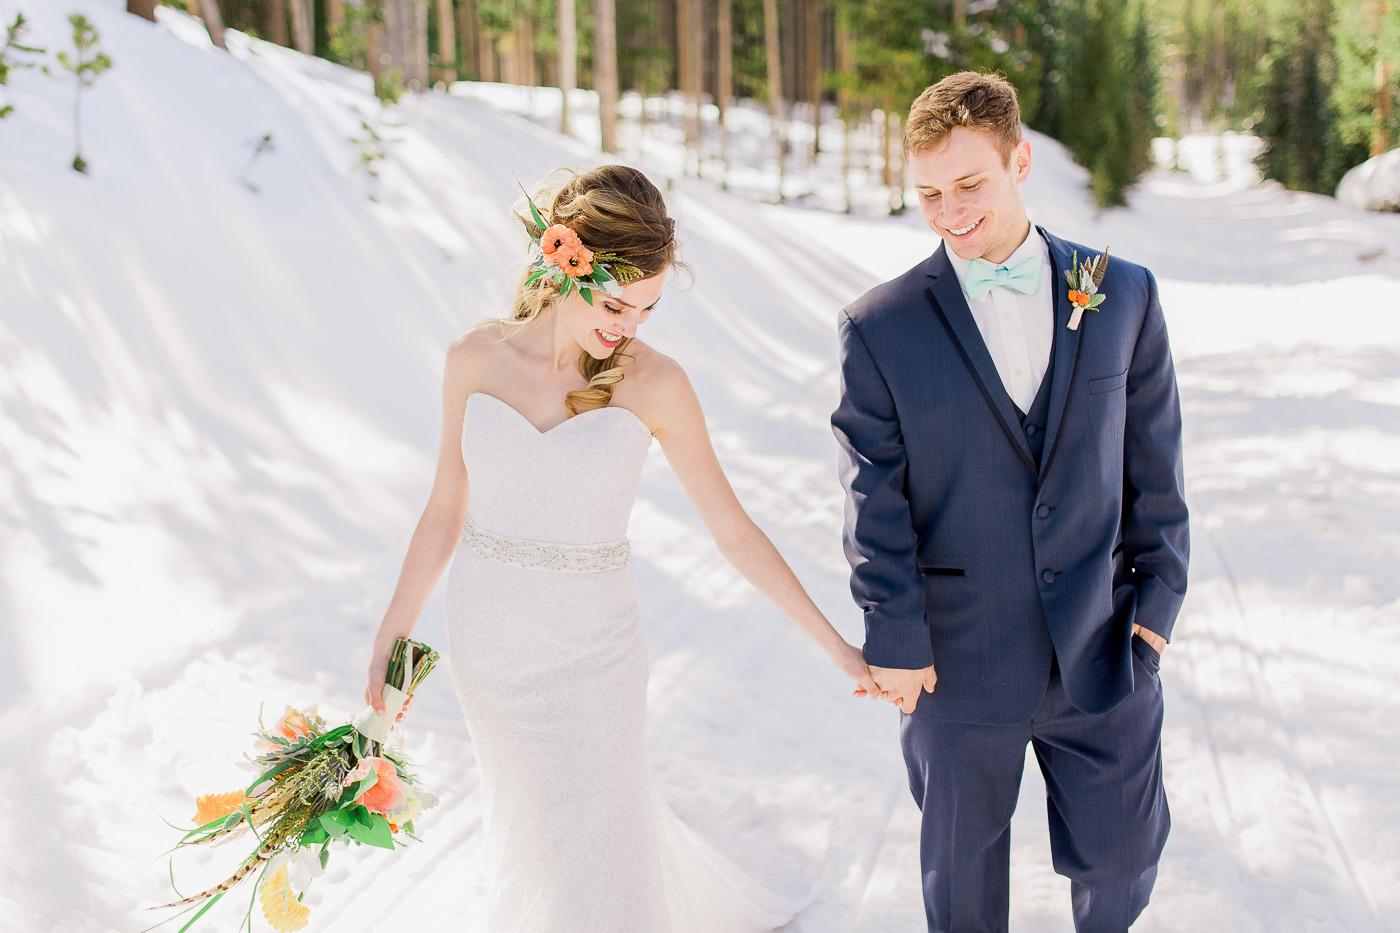 Snowy Range Mountains Wyoming Couples Session Photography by Laramie Based wedding photographer